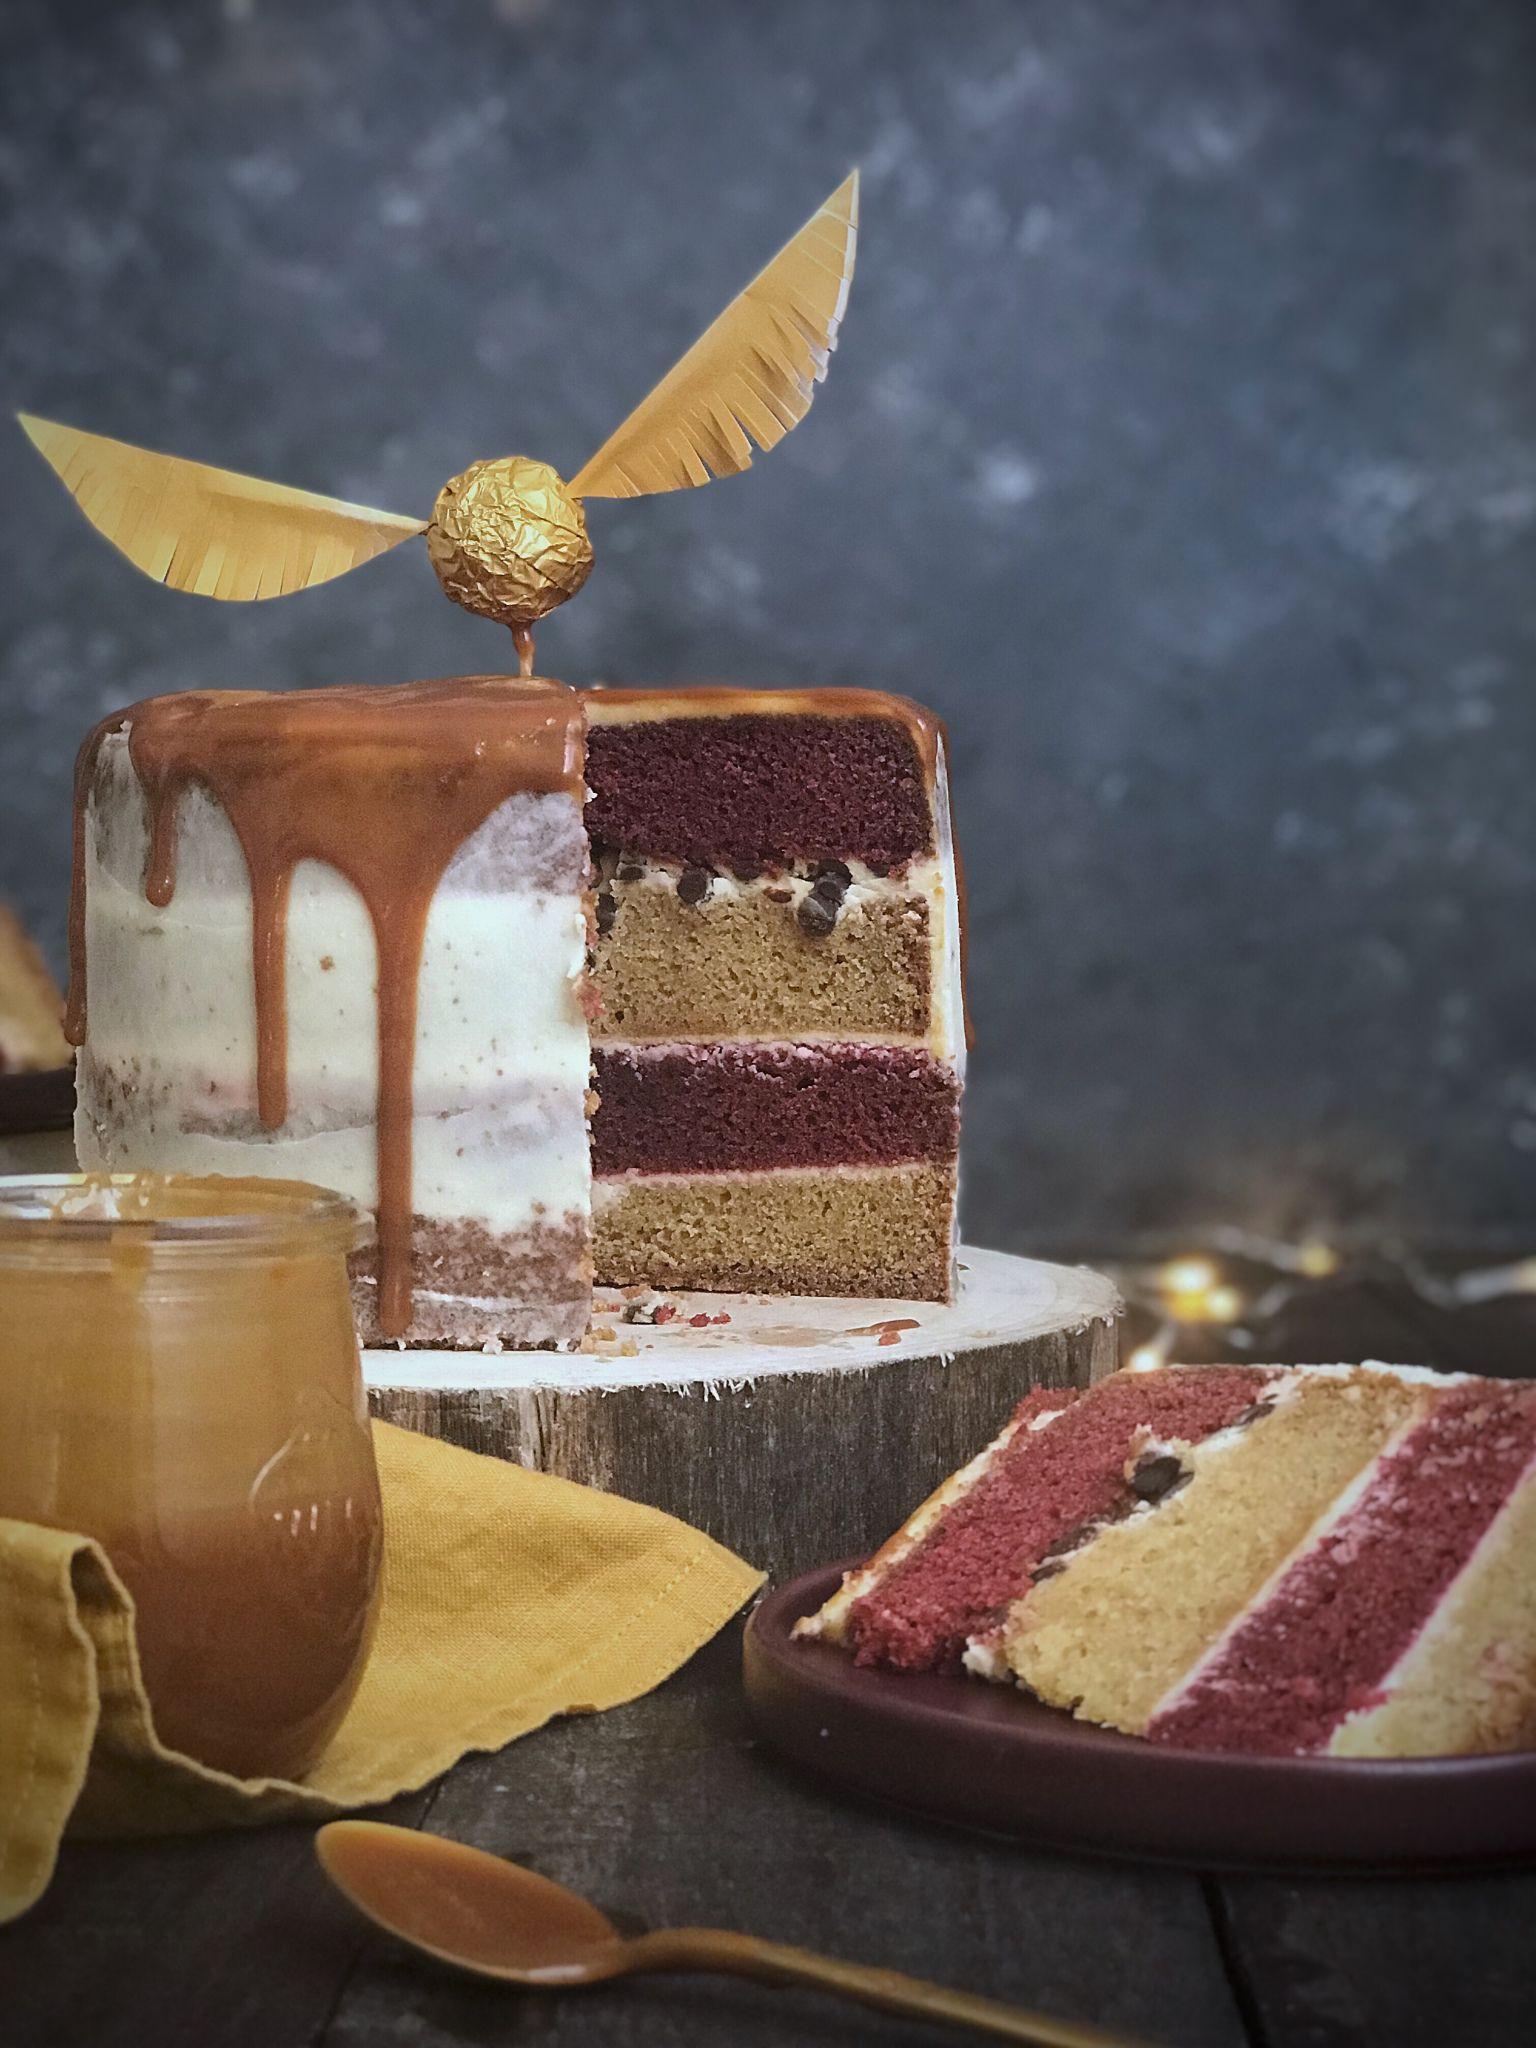 Harrypotterbabystuff Ergebnis Kuchen Potter Harry Bild Fur Frbild E Harry Potter Kuchen Einfach Kuchen Torte Kindergeburtstag Harry Potter Torte Rezept